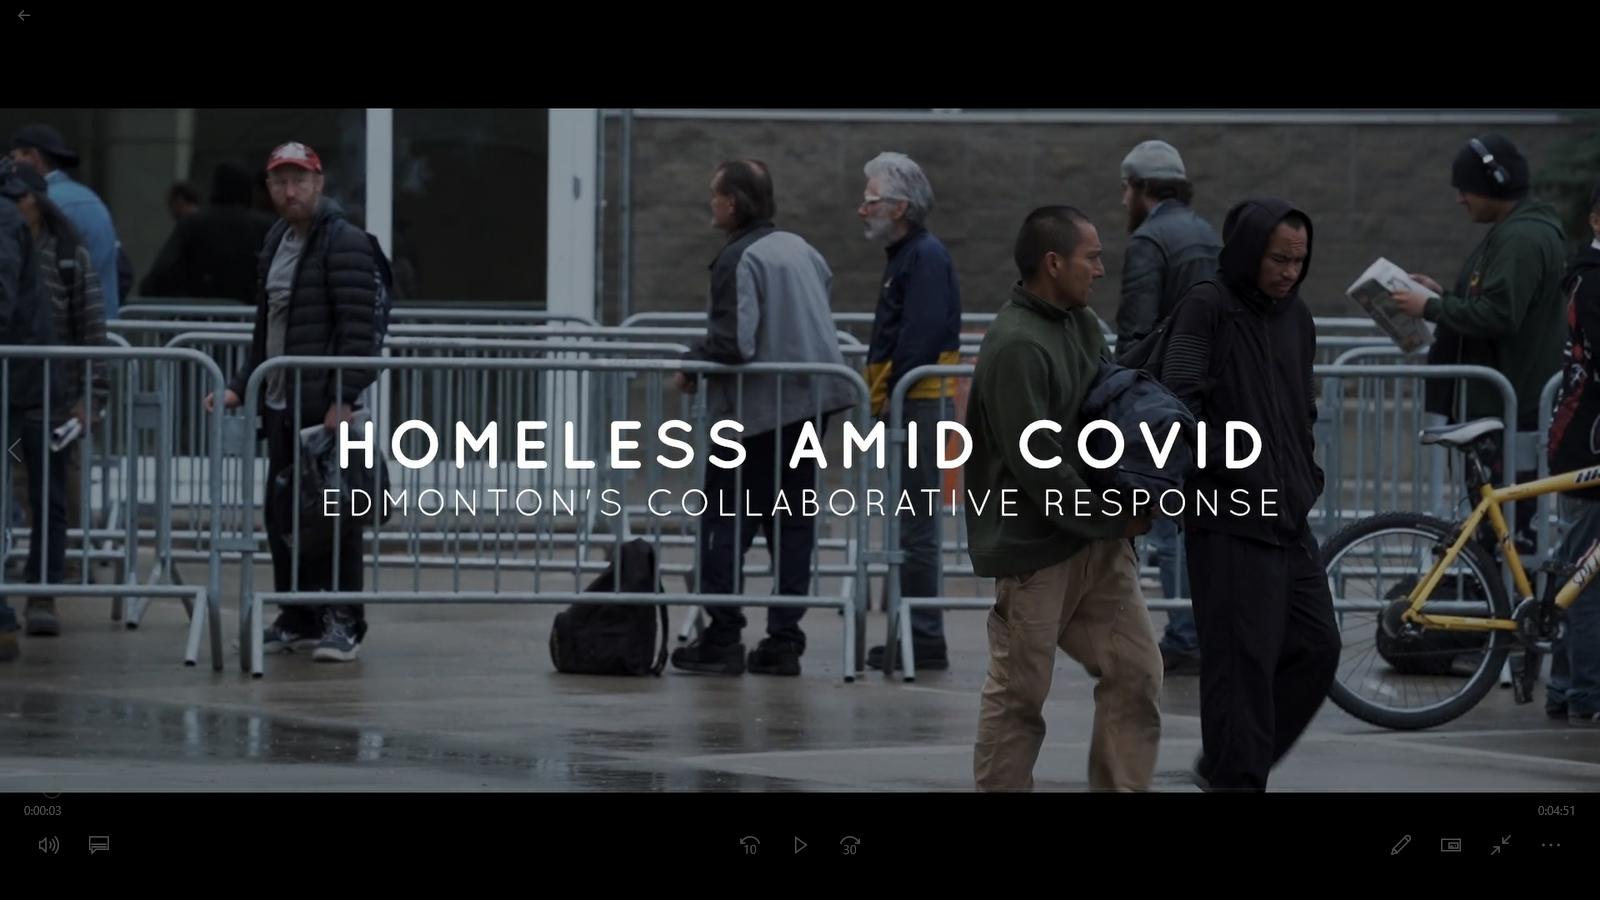 homeless amid covid - edmonton's collaborative response